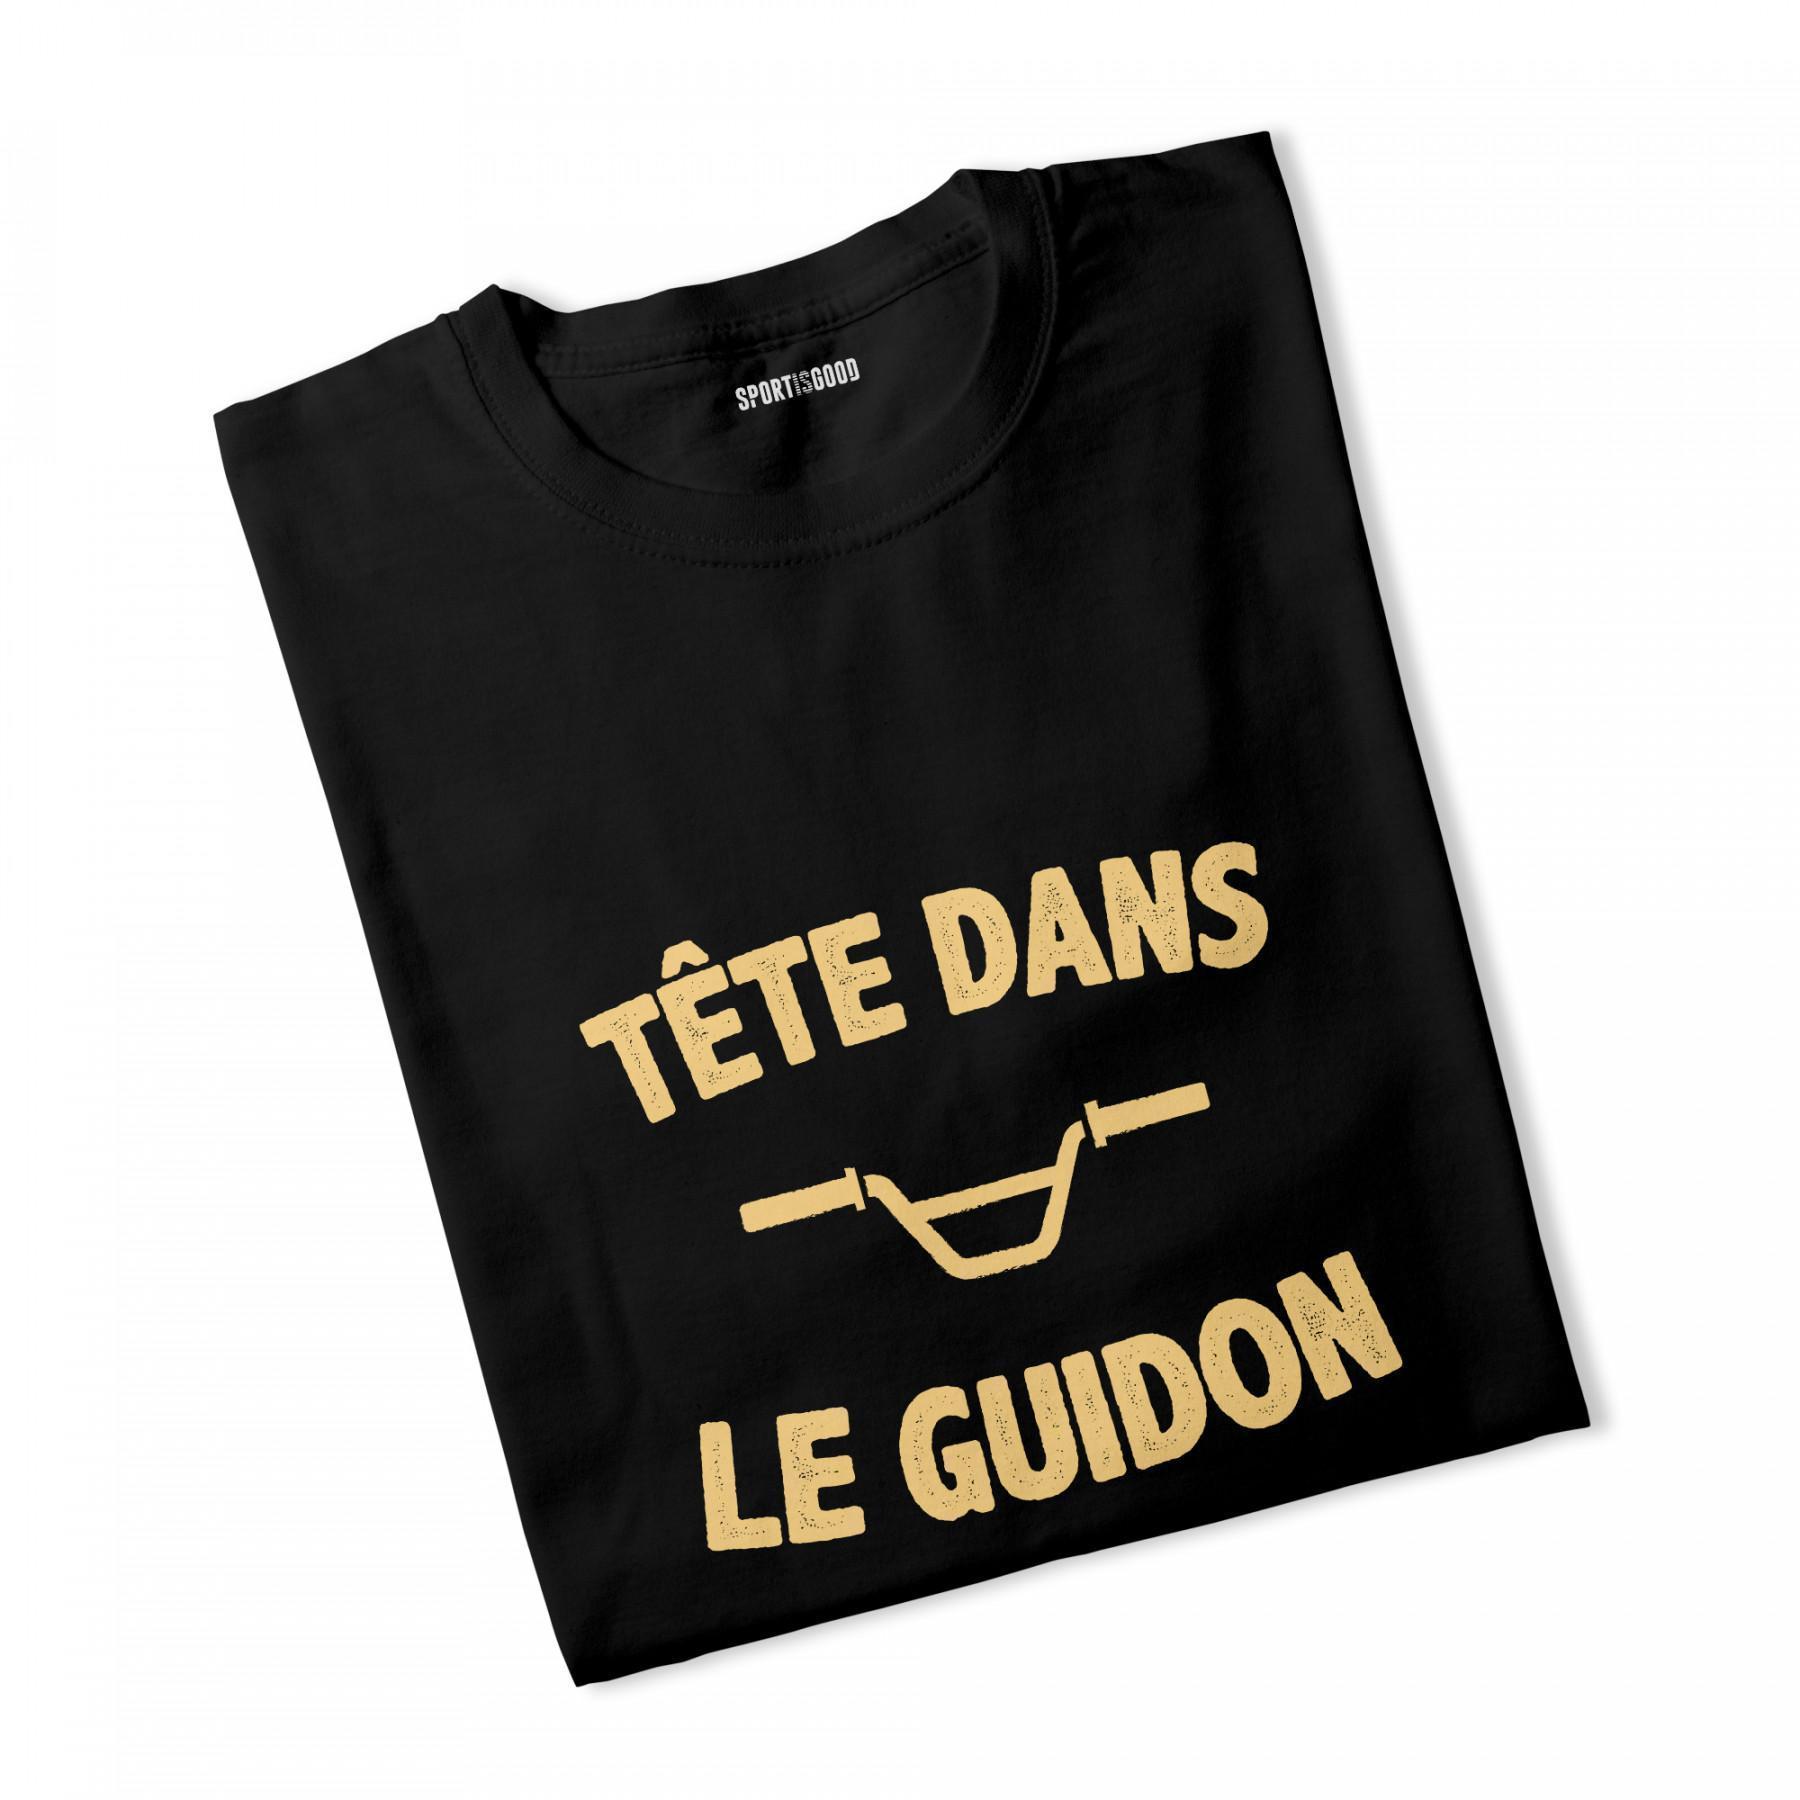 T-shirt garçon Tête dans le guidon